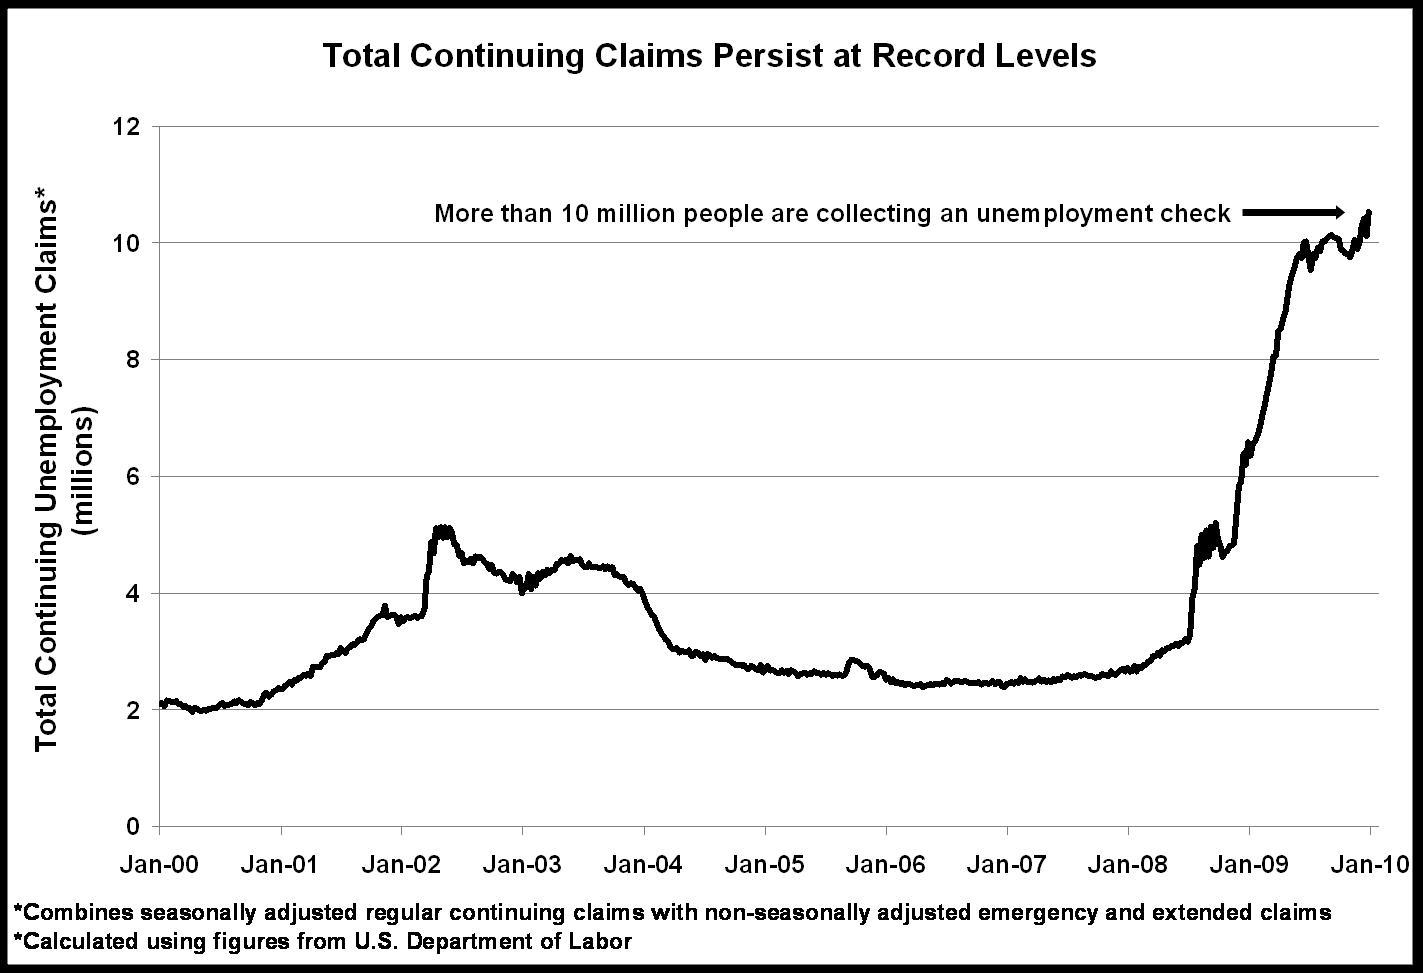 2010-01-25-UnemploymentClaims2.0.jpg